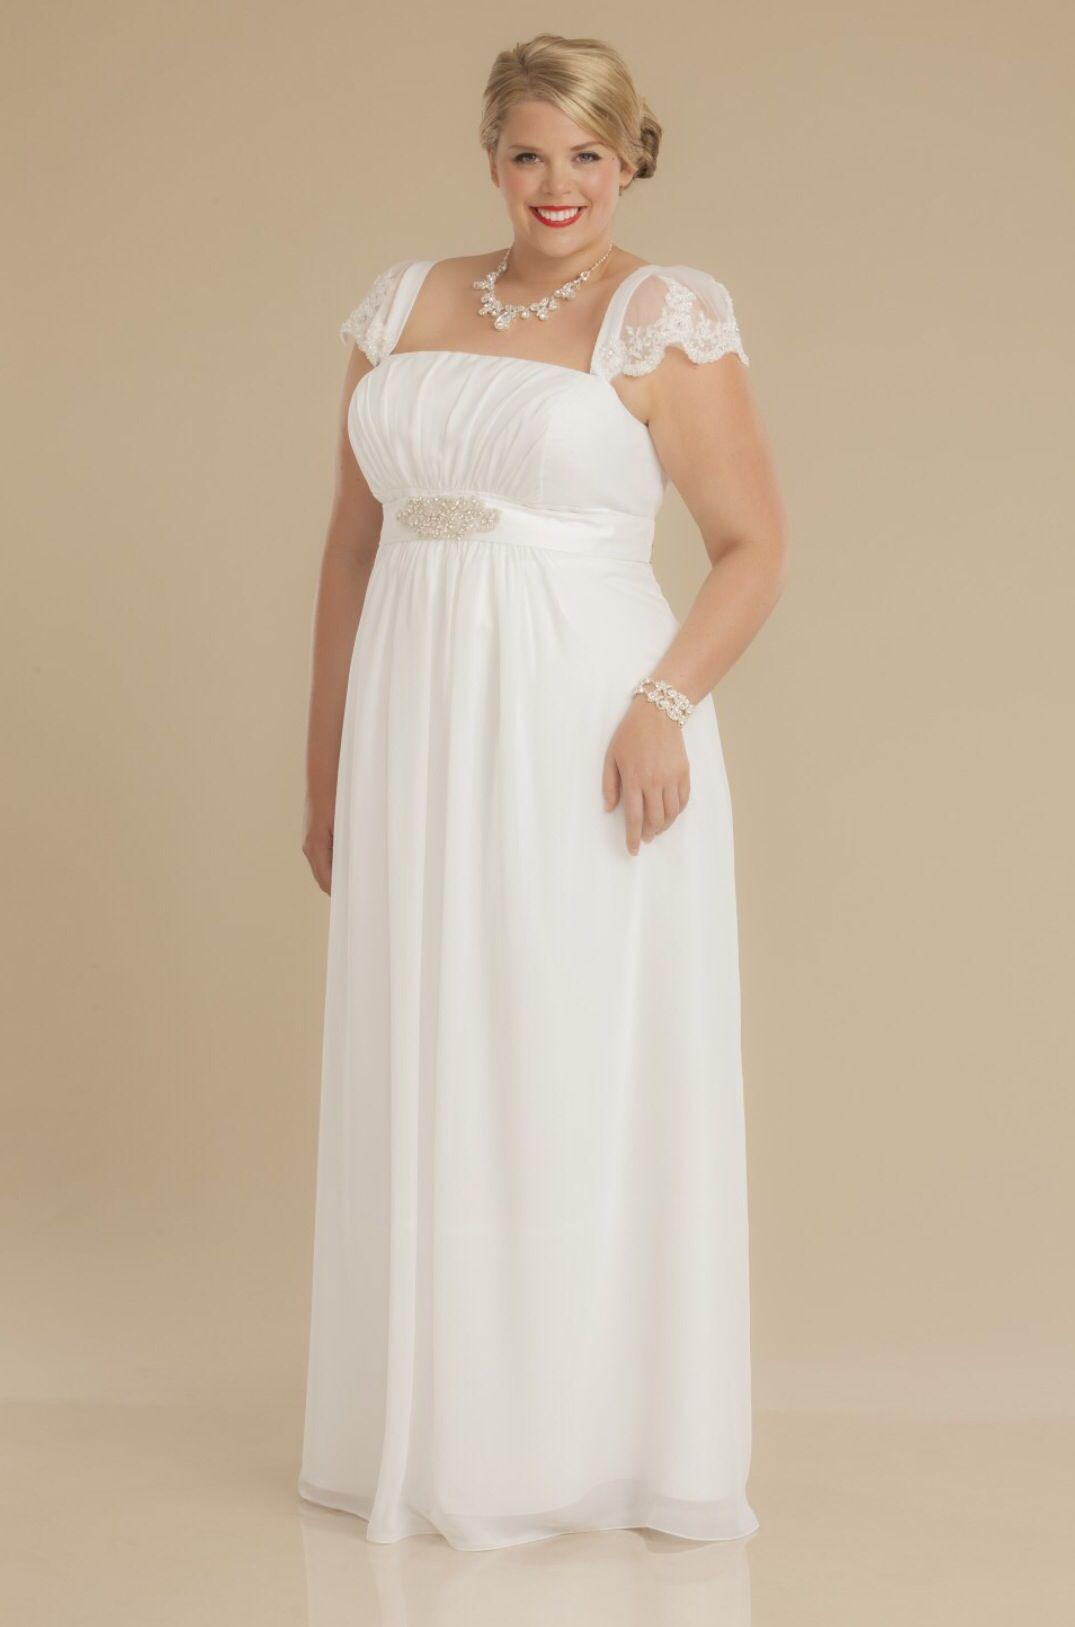 Maternity wedding dresses david's bridal  So canut decide  Mariage et accessoires  Pinterest  Wedding